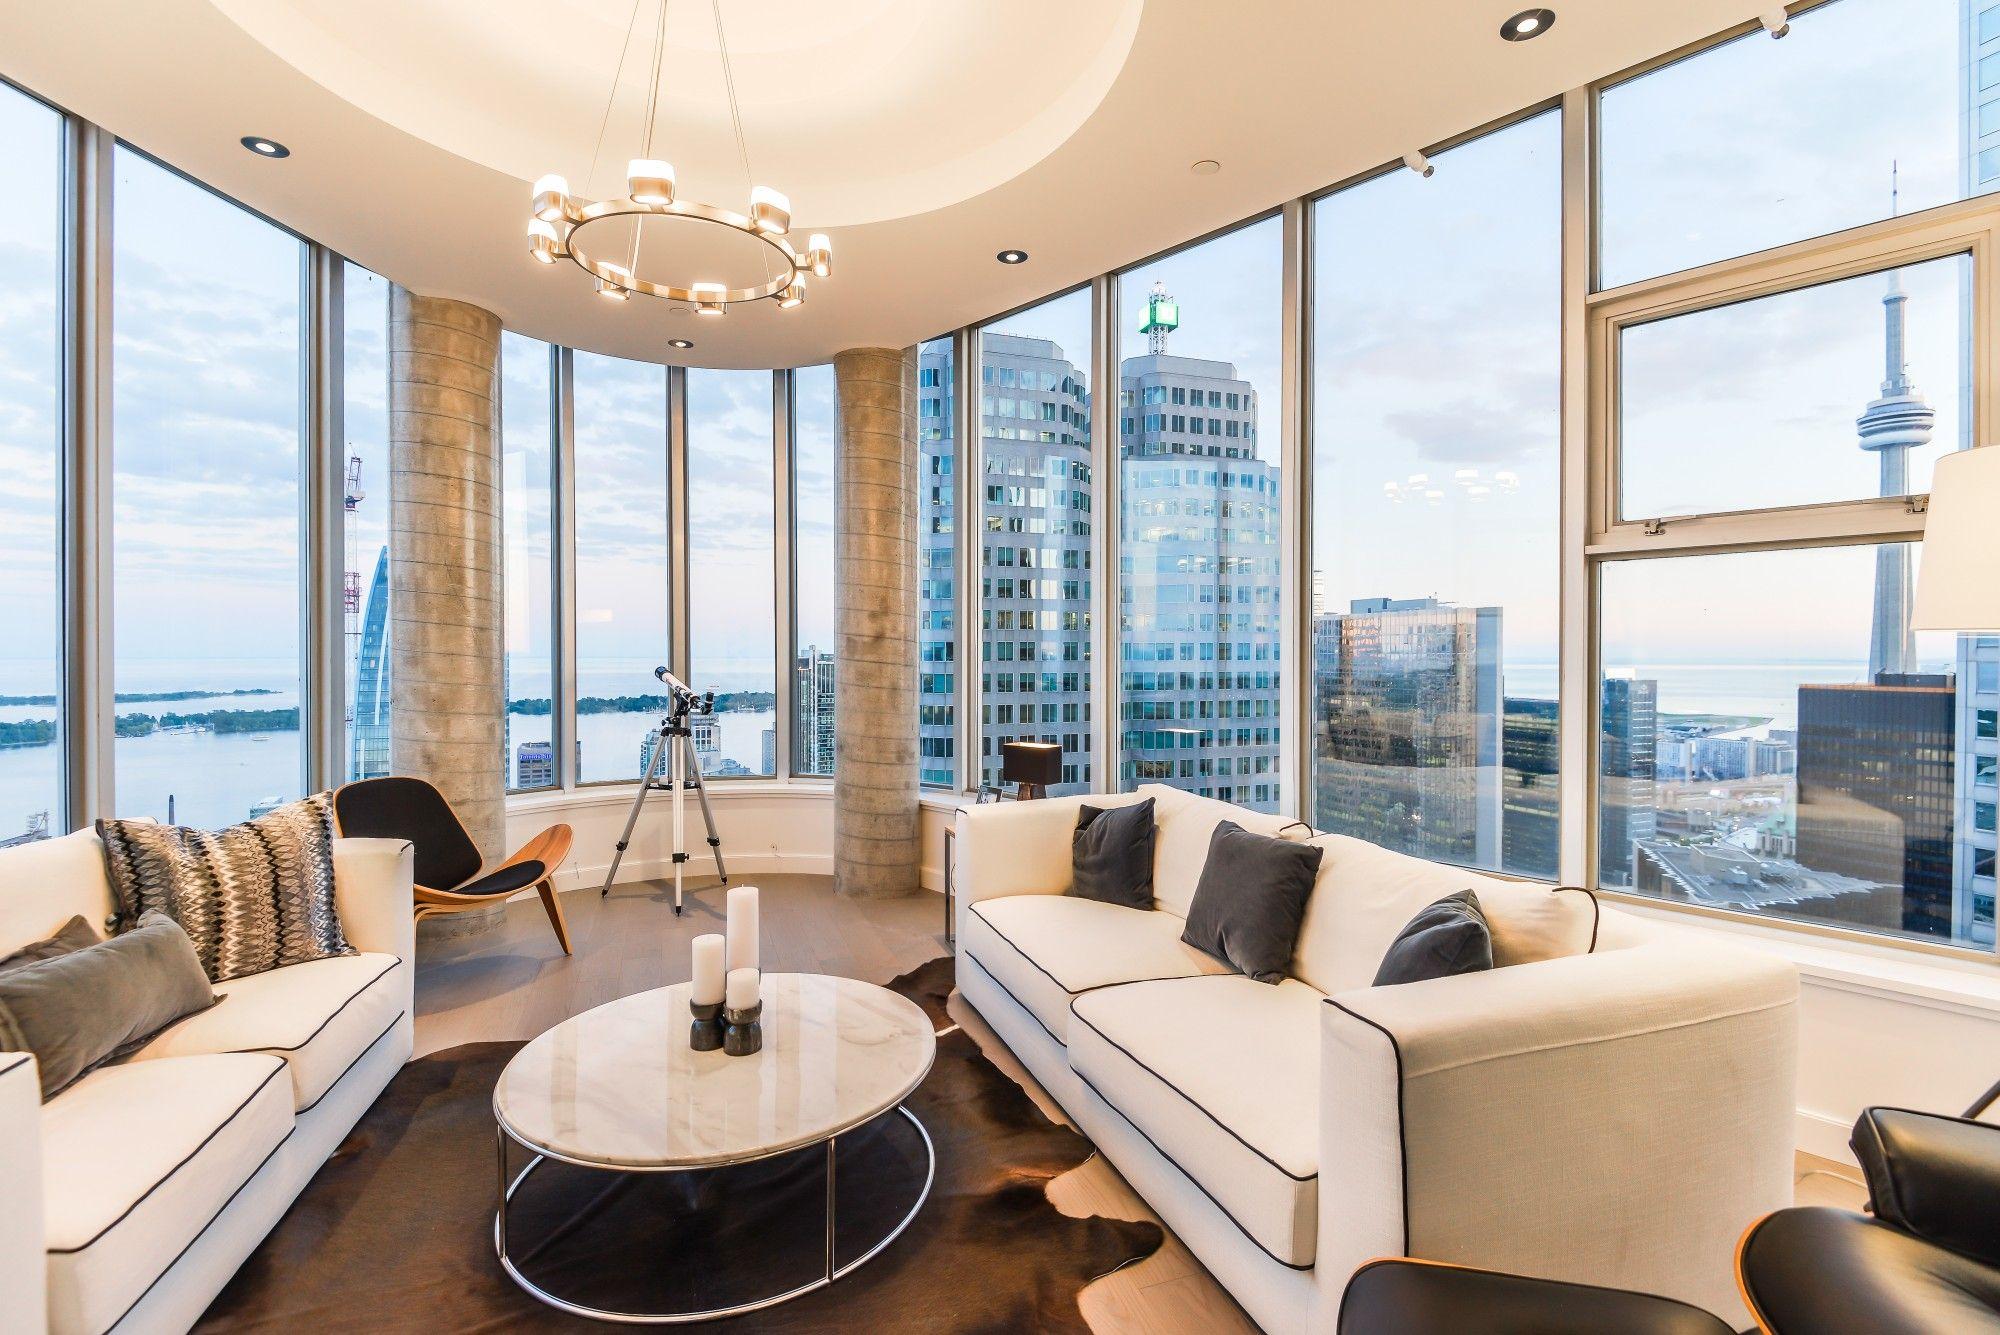 The 3 4 Million Penthouse That Proves Super Luxurious Condos Can Be Tough To Sell Condo Living Condo Interior Condo Decorating